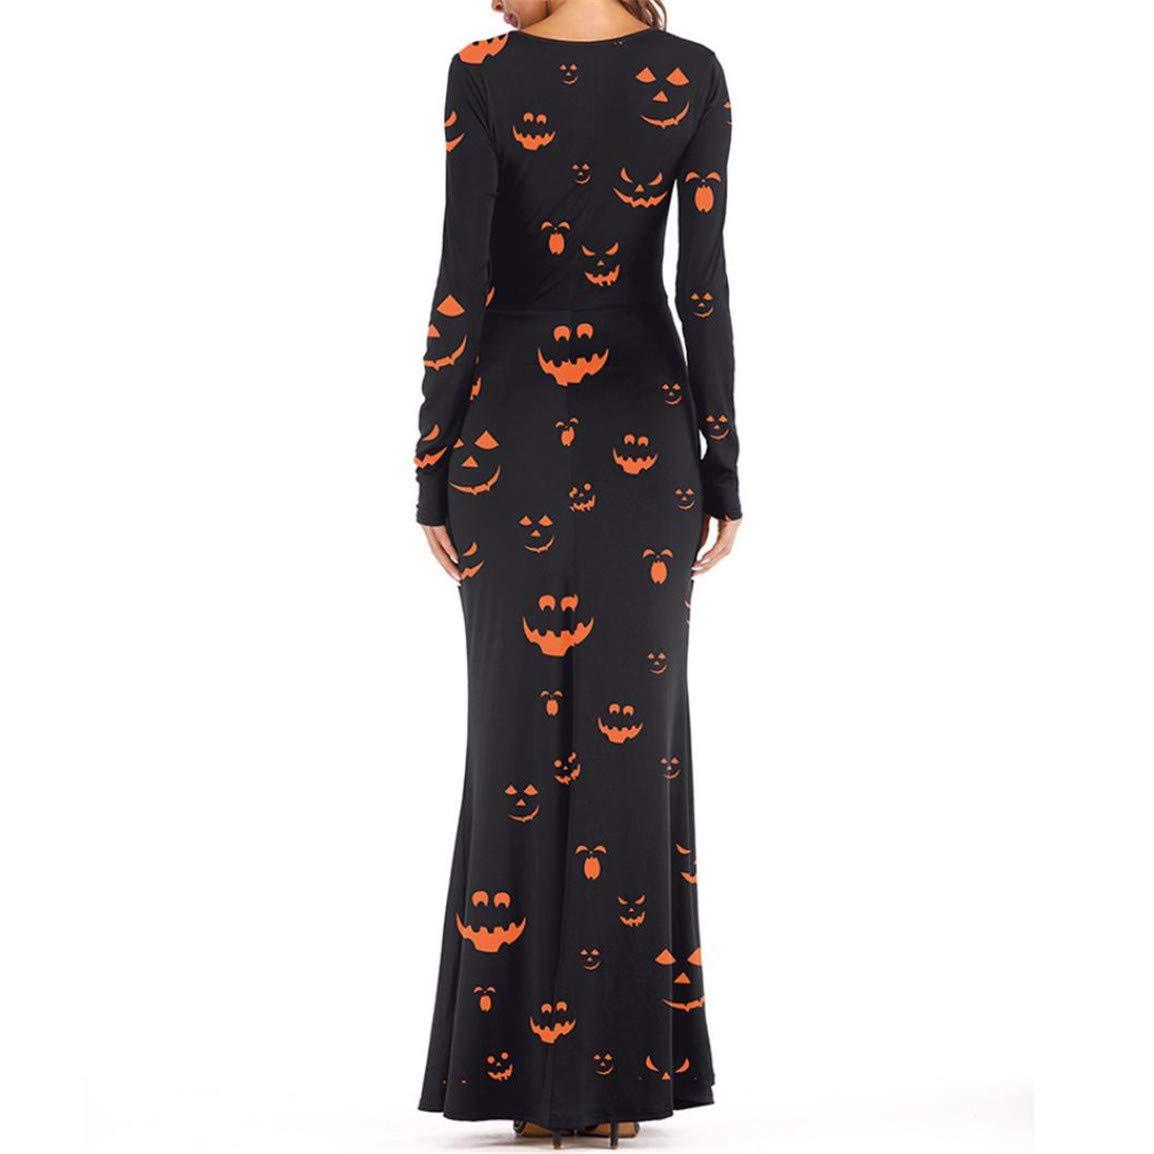 4883b62384ce3d Sport & Freizeit Moonuy Frauen Knöchellangen Kleid Damen Langarm Kleidung  Kürbisse Halloween 3D Print Casual Abend ...